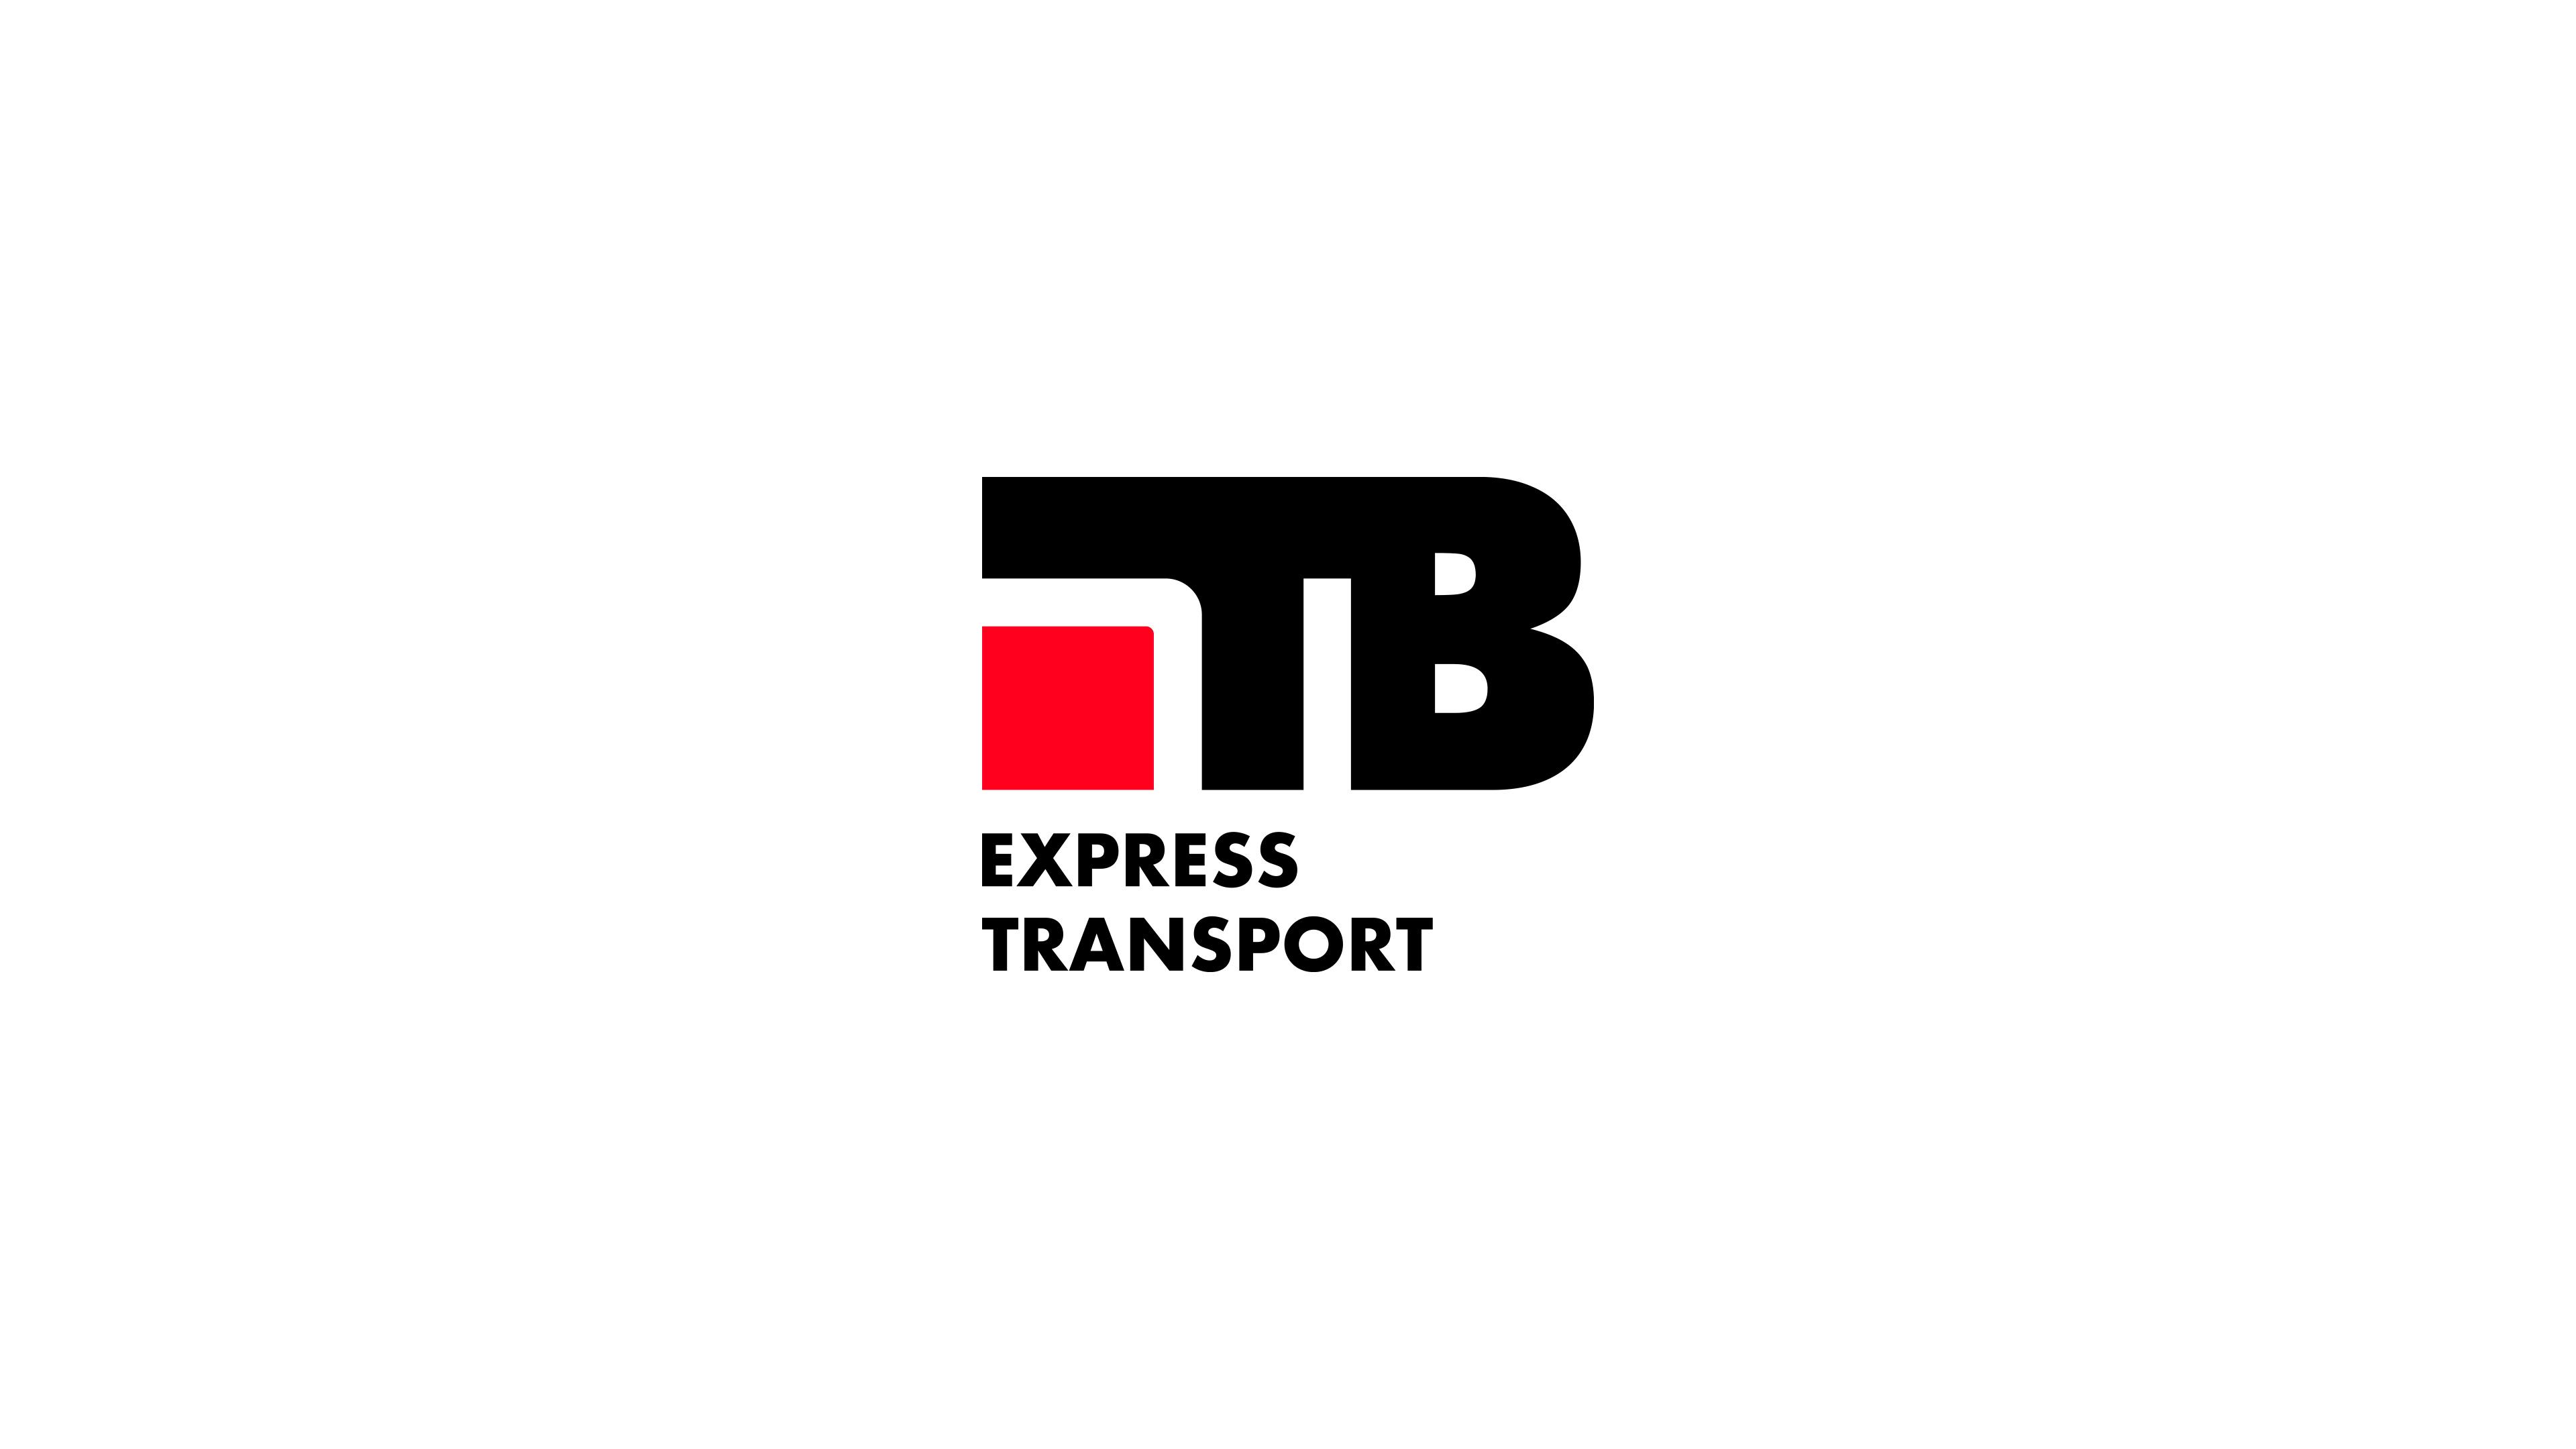 TB Express Transport